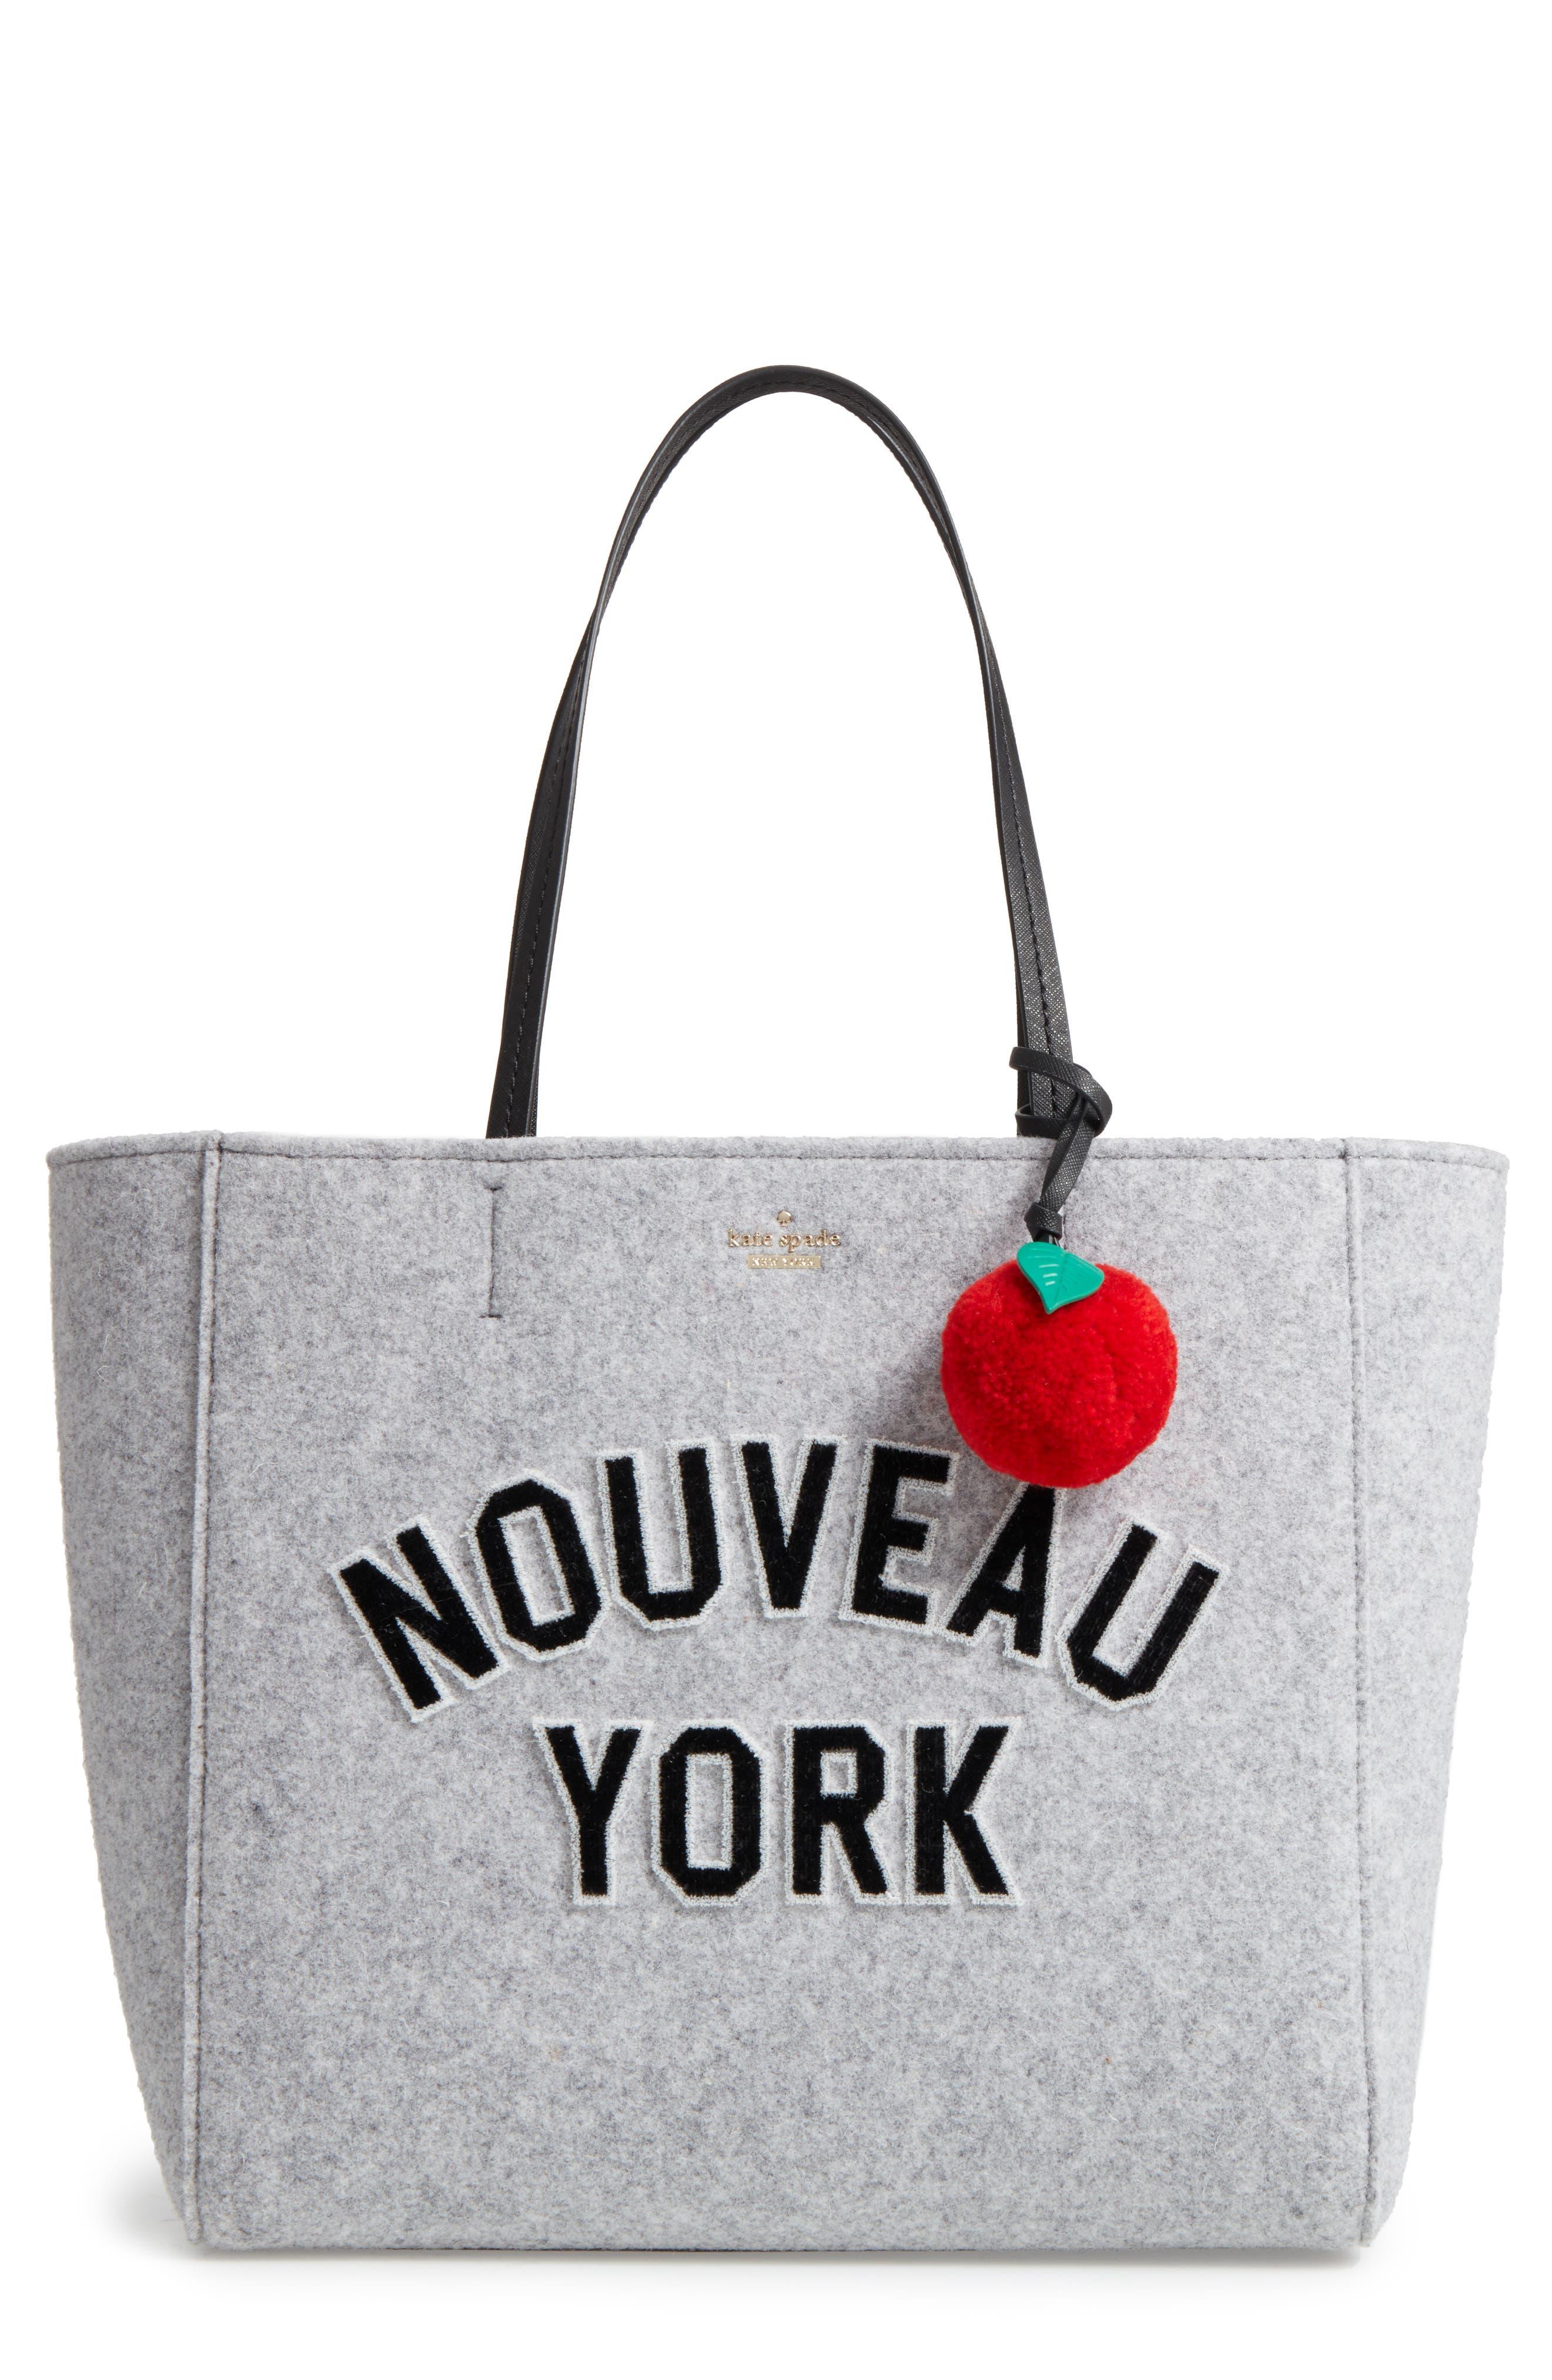 nouveau york - hallie flannel tote & apple pom bag charm,                         Main,                         color, Light Charcoal